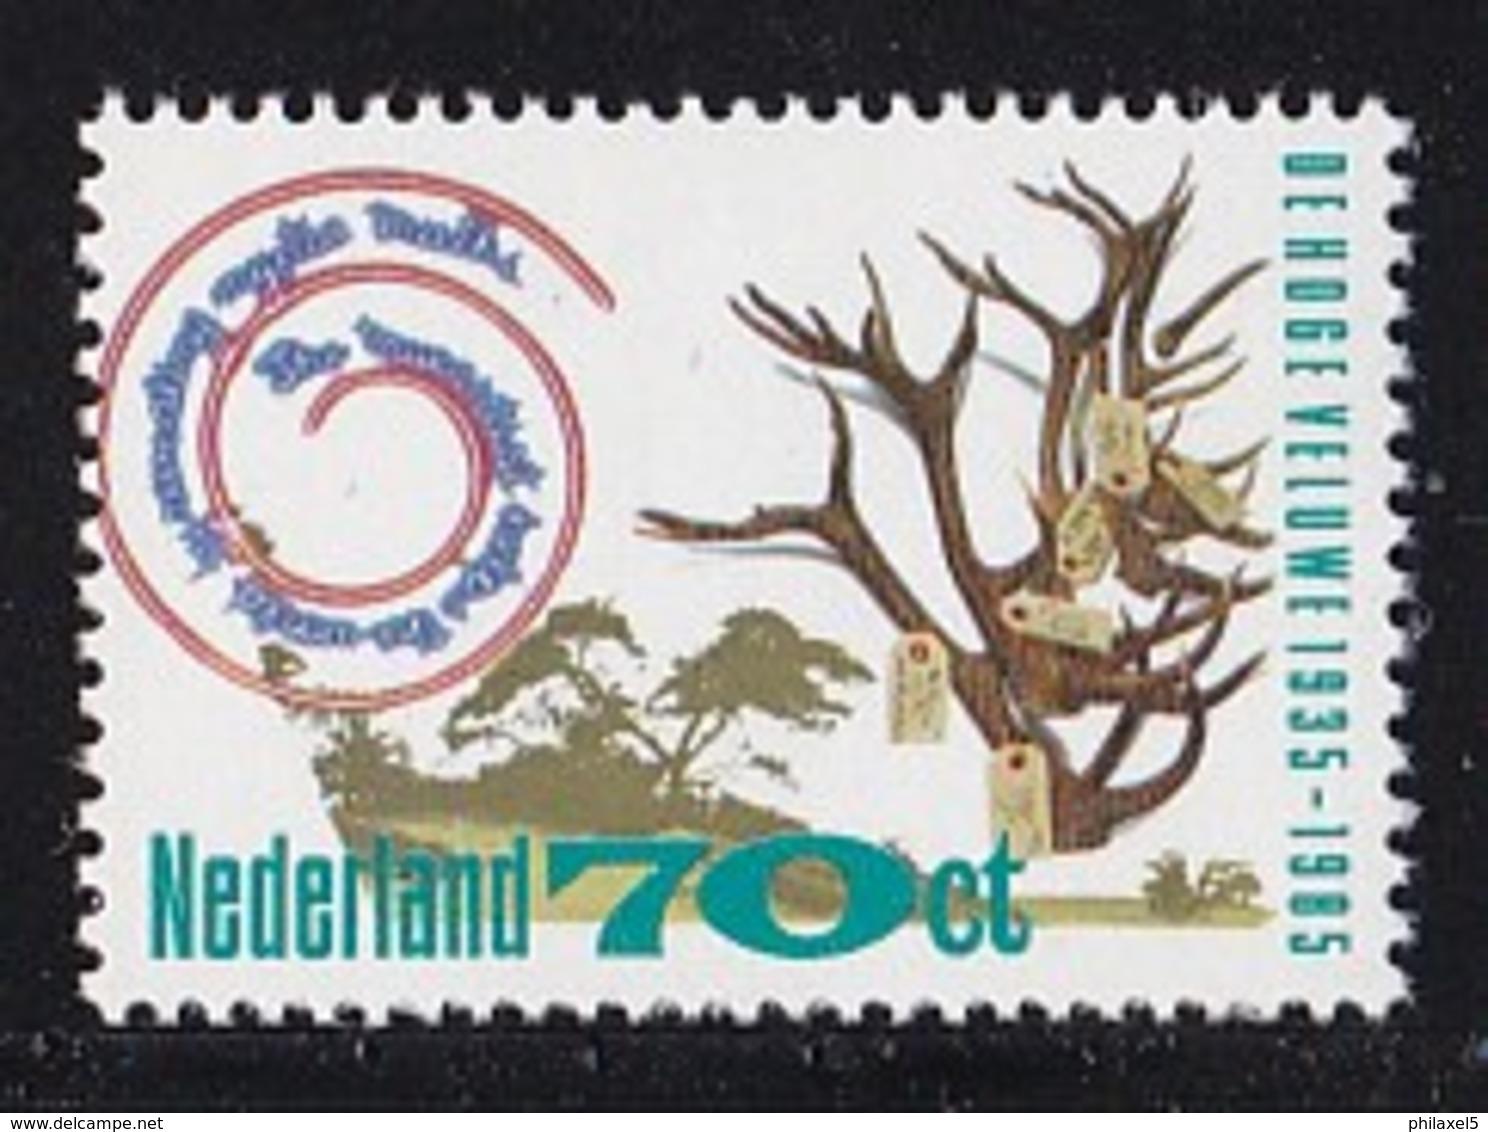 Nederland - De Hoge Veluwe 1935 - 1985 - Provincie Gelderland -  MNH - NVPH 1323 - Aardrijkskunde